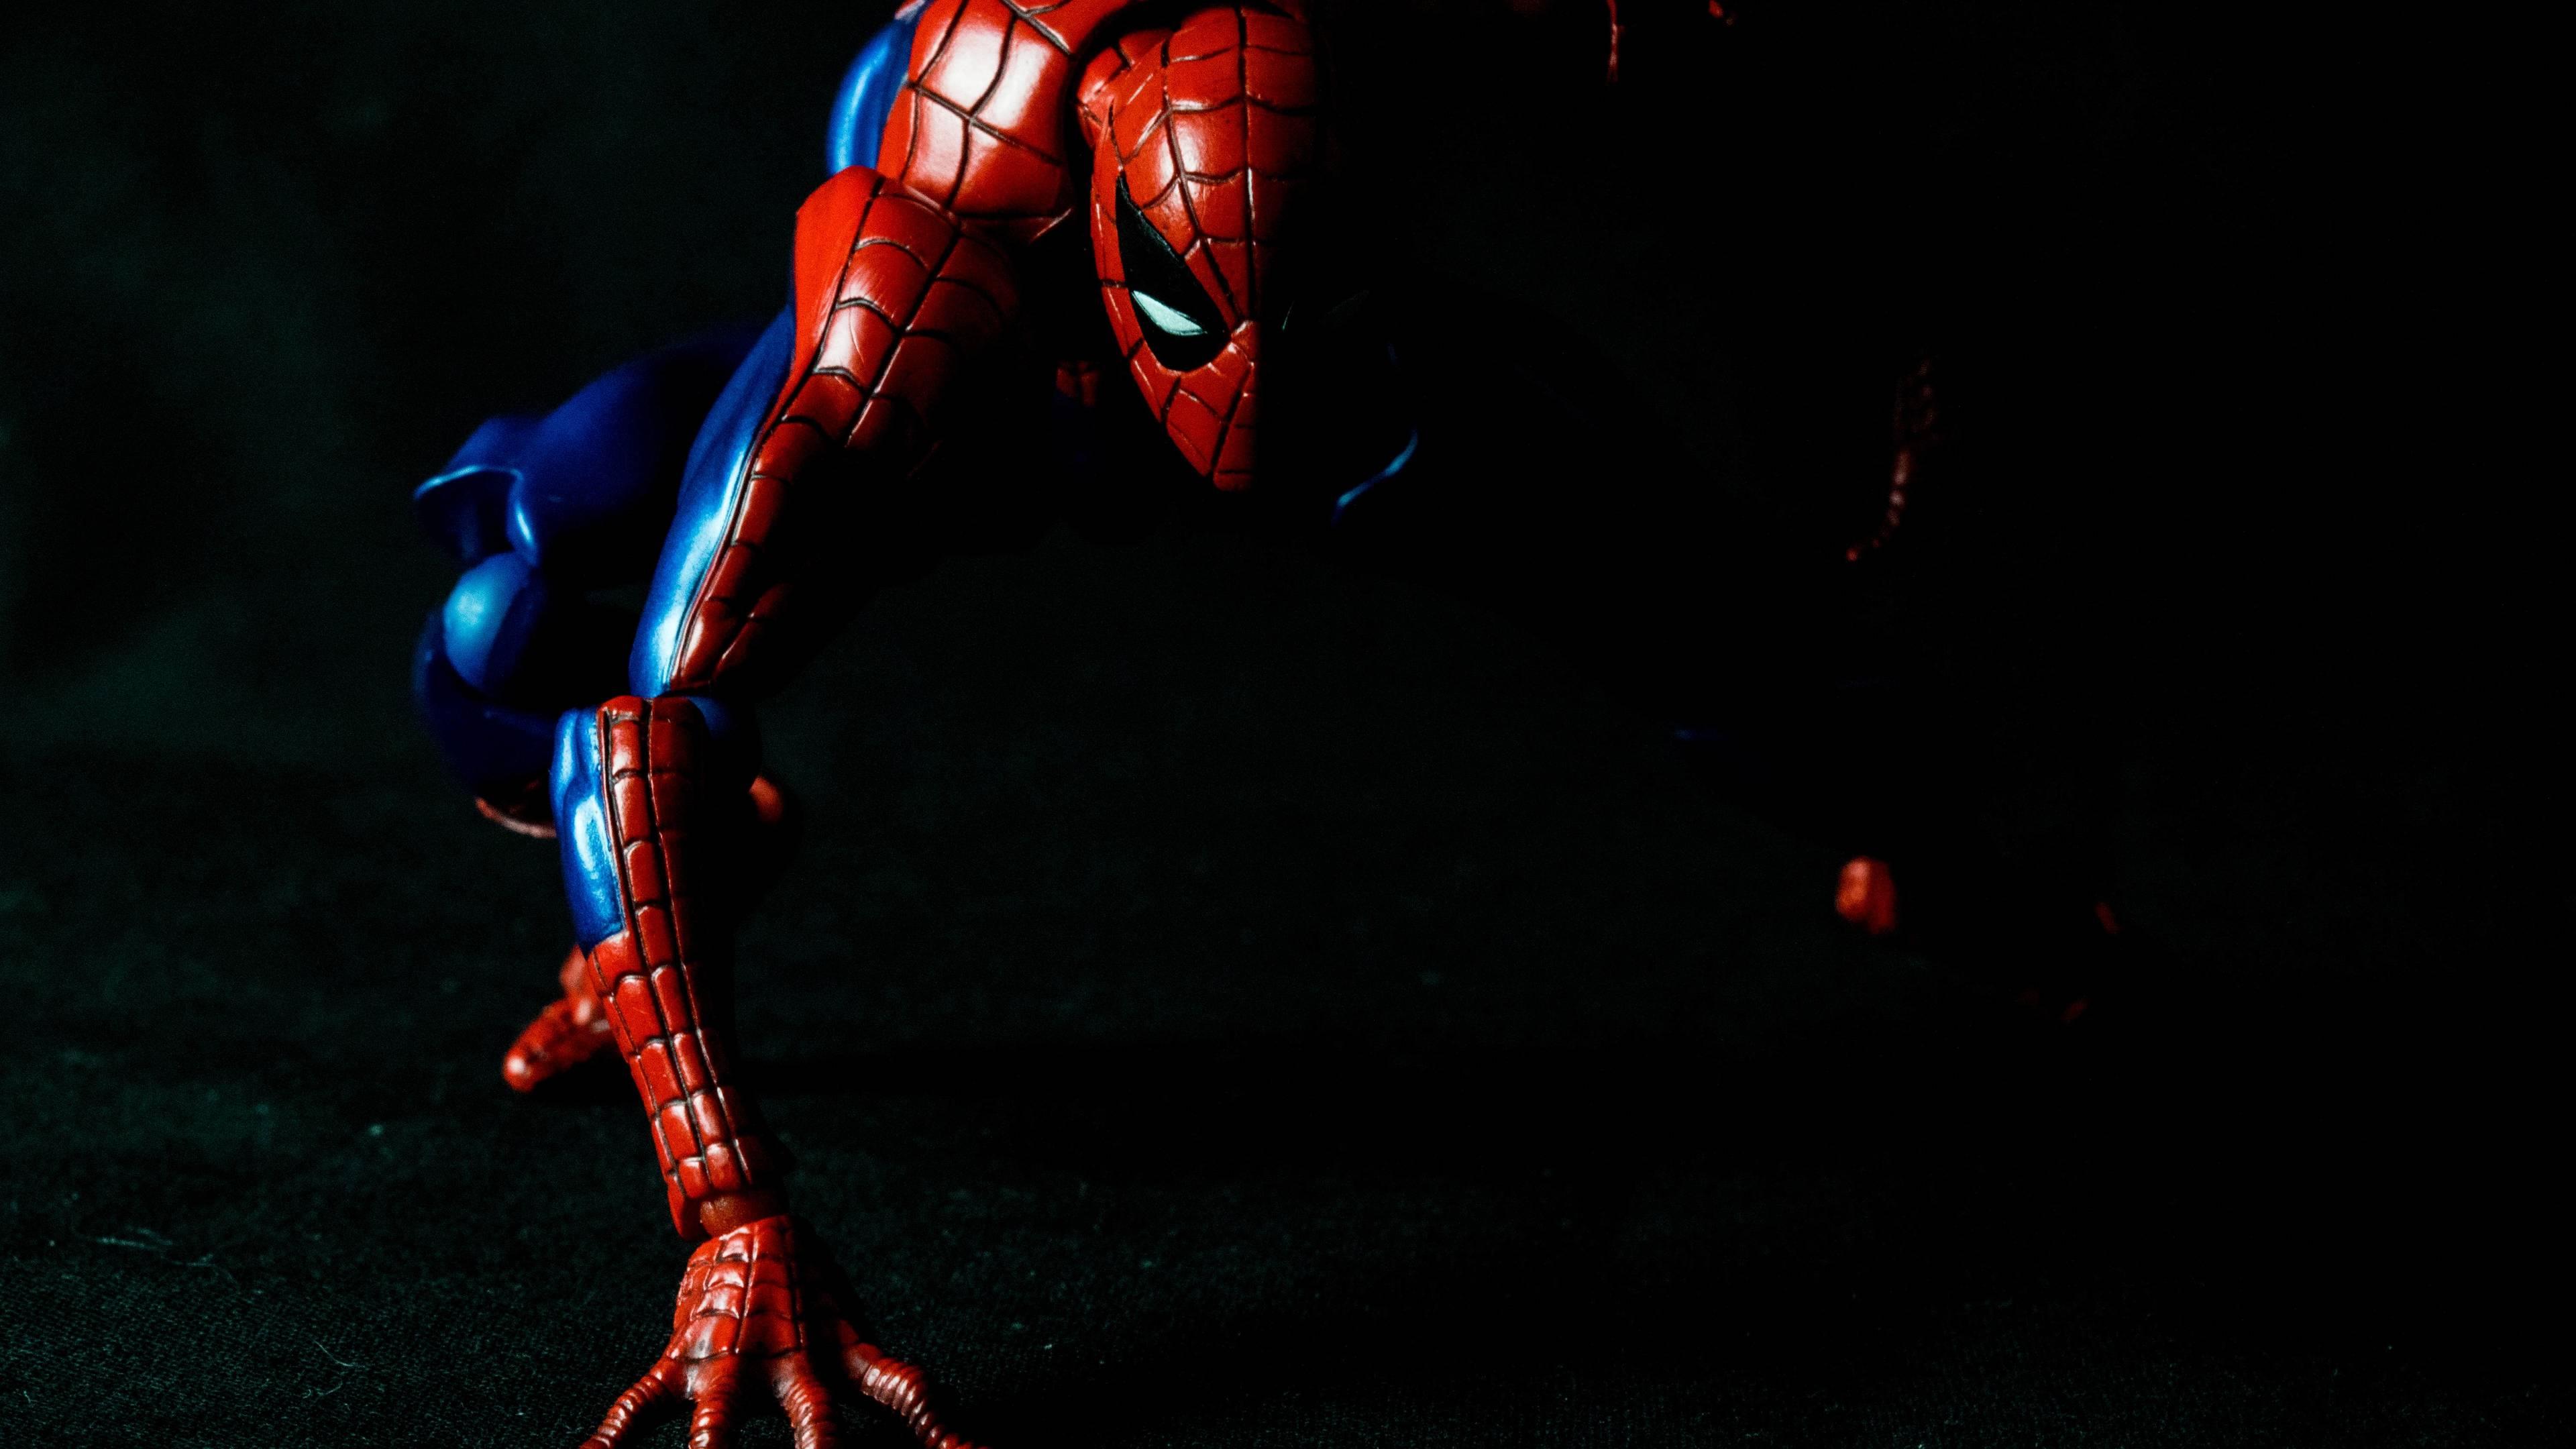 spiderman web of shadows 1536522706 - Spiderman Web Of Shadows - superheroes wallpapers, spiderman wallpapers, reddit wallpapers, hd-wallpapers, artist wallpapers, 5k wallpapers, 4k-wallpapers